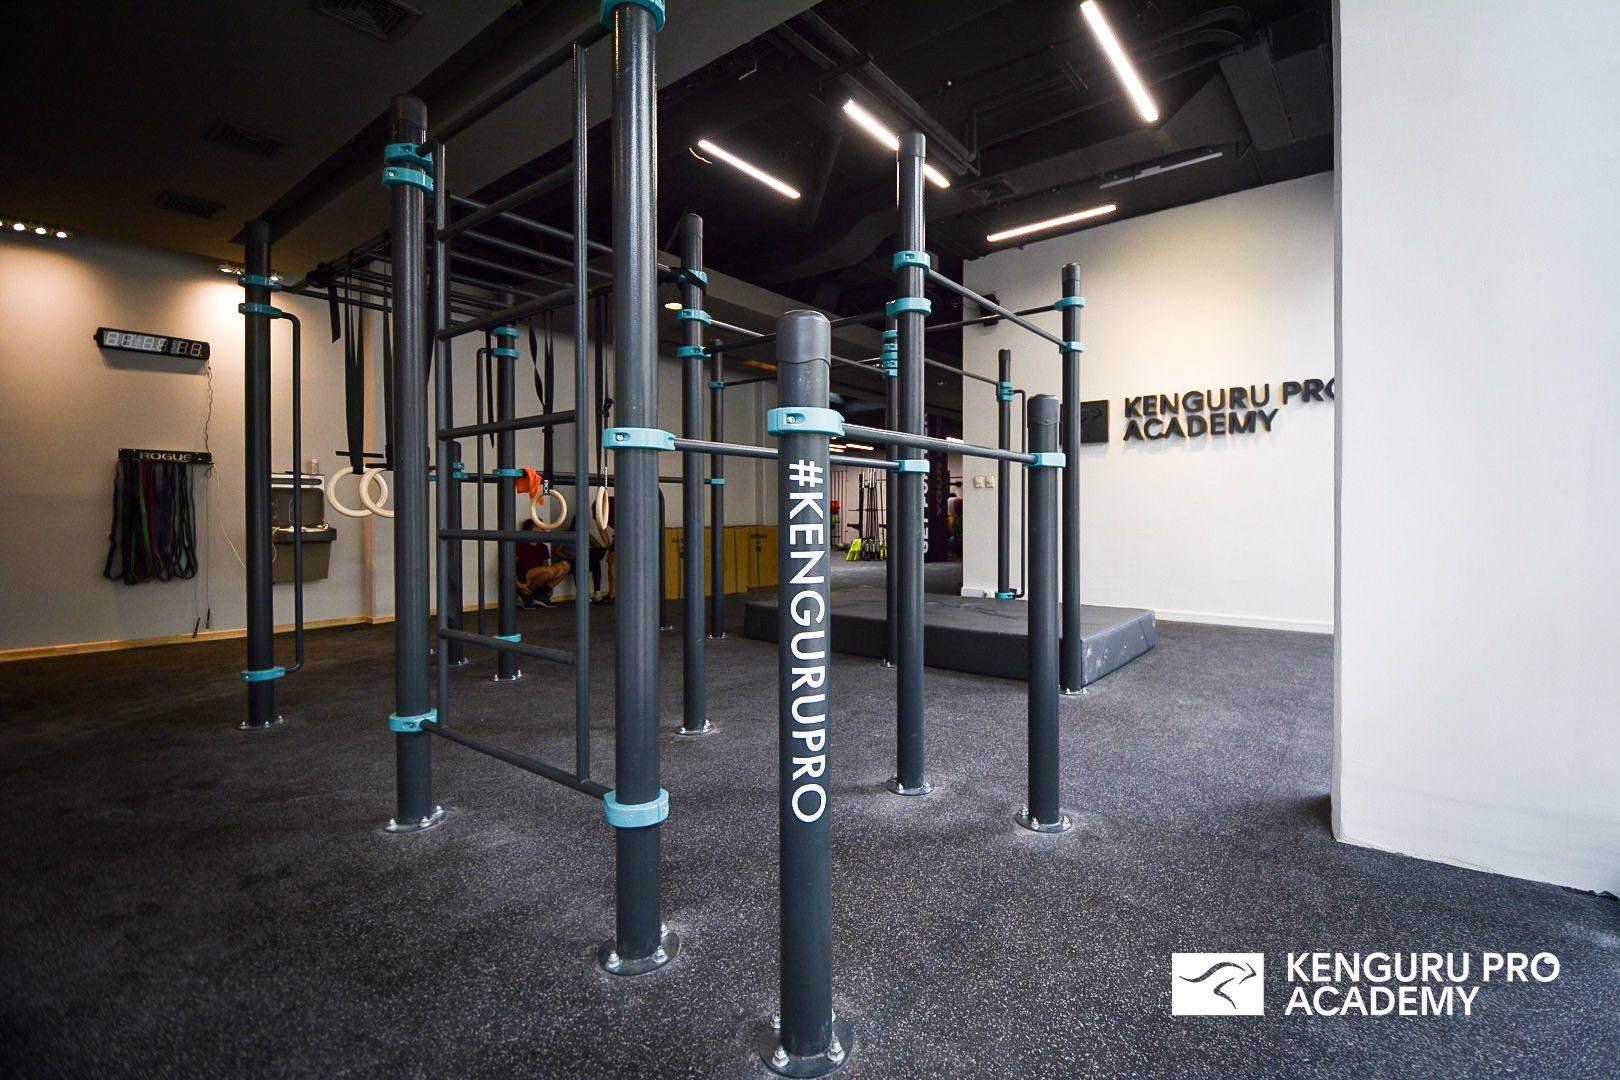 Indoor Street Workout Gym Equipment Park Workout Calisthenics Gym Gym Design